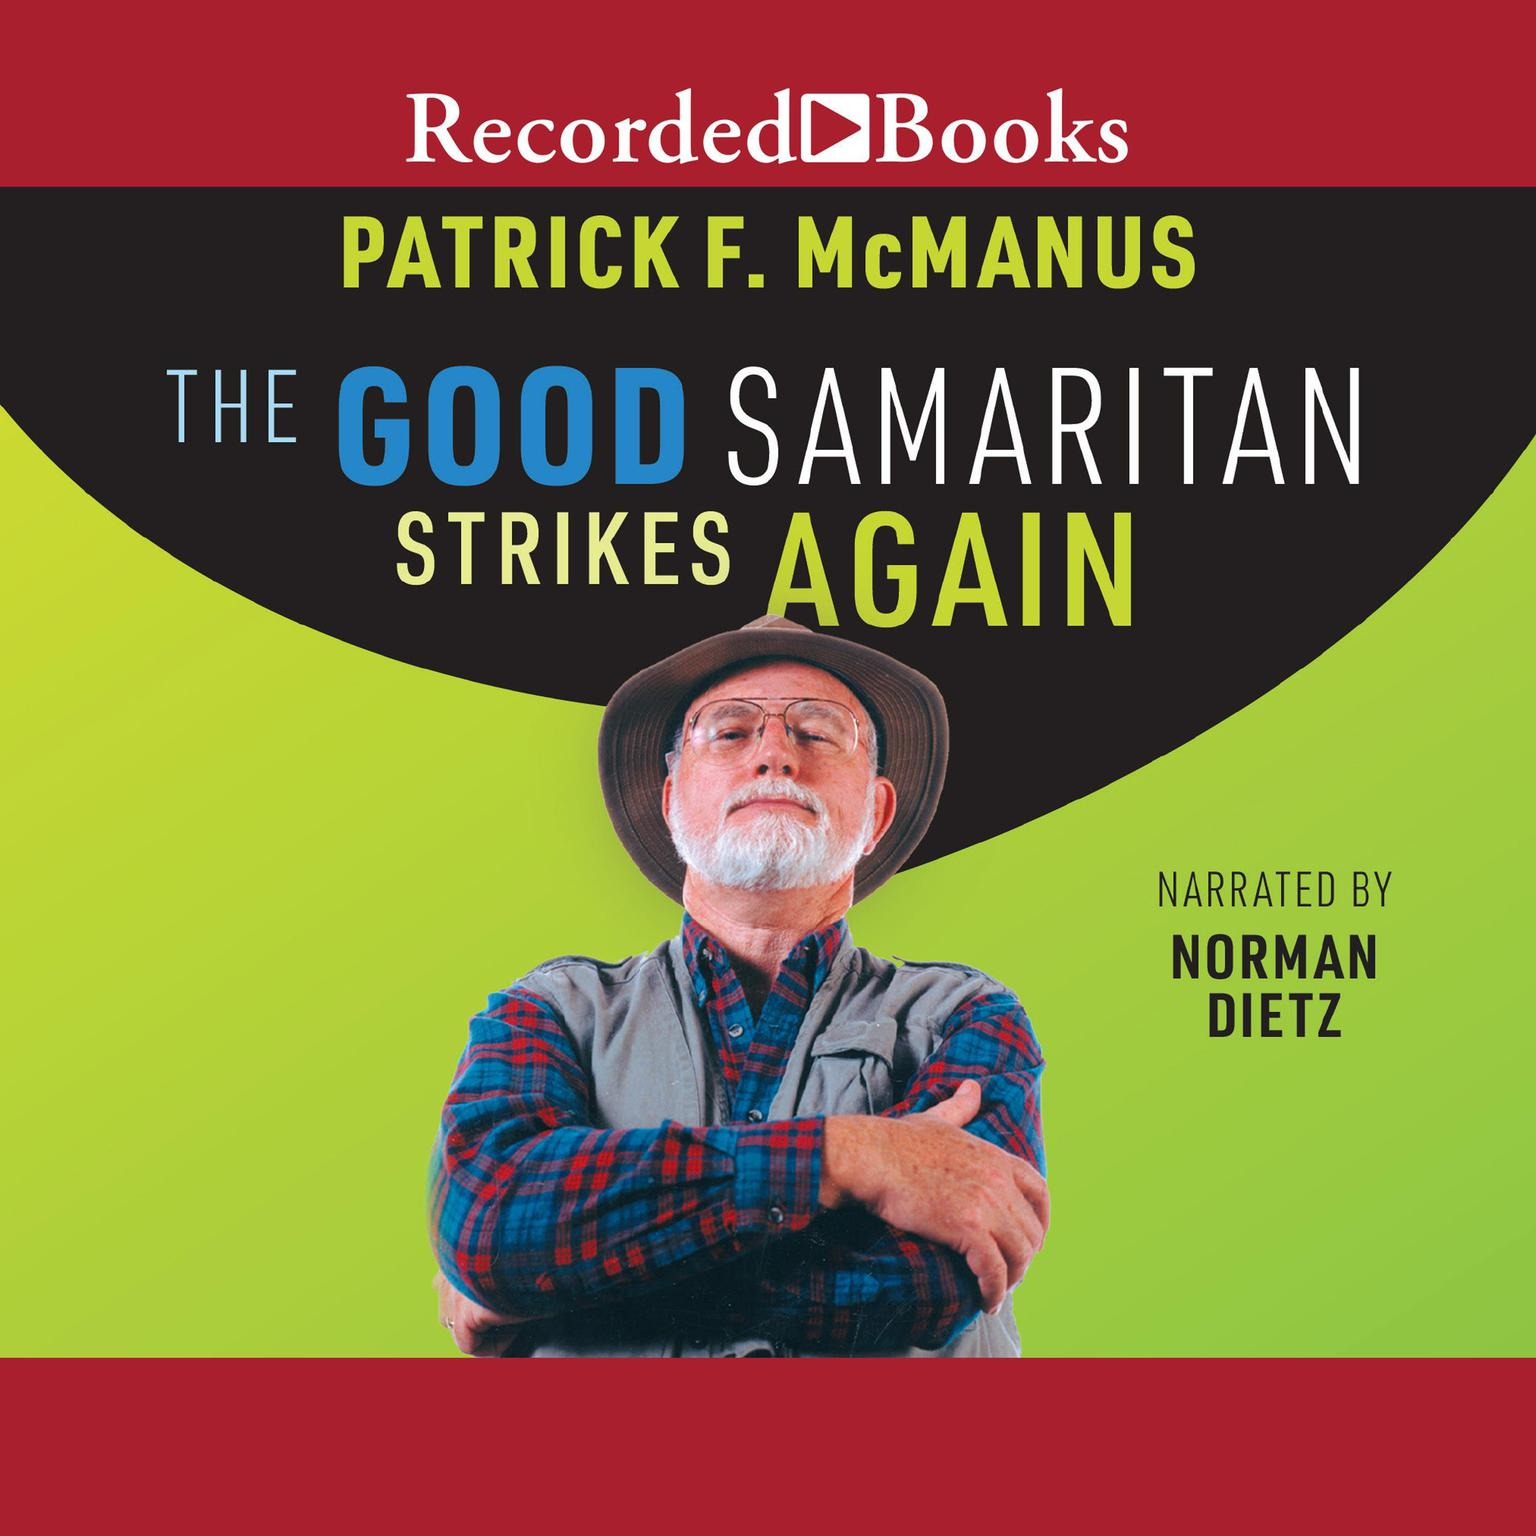 The Good Samaritan Strikes Again Audiobook, by Patrick F. McManus